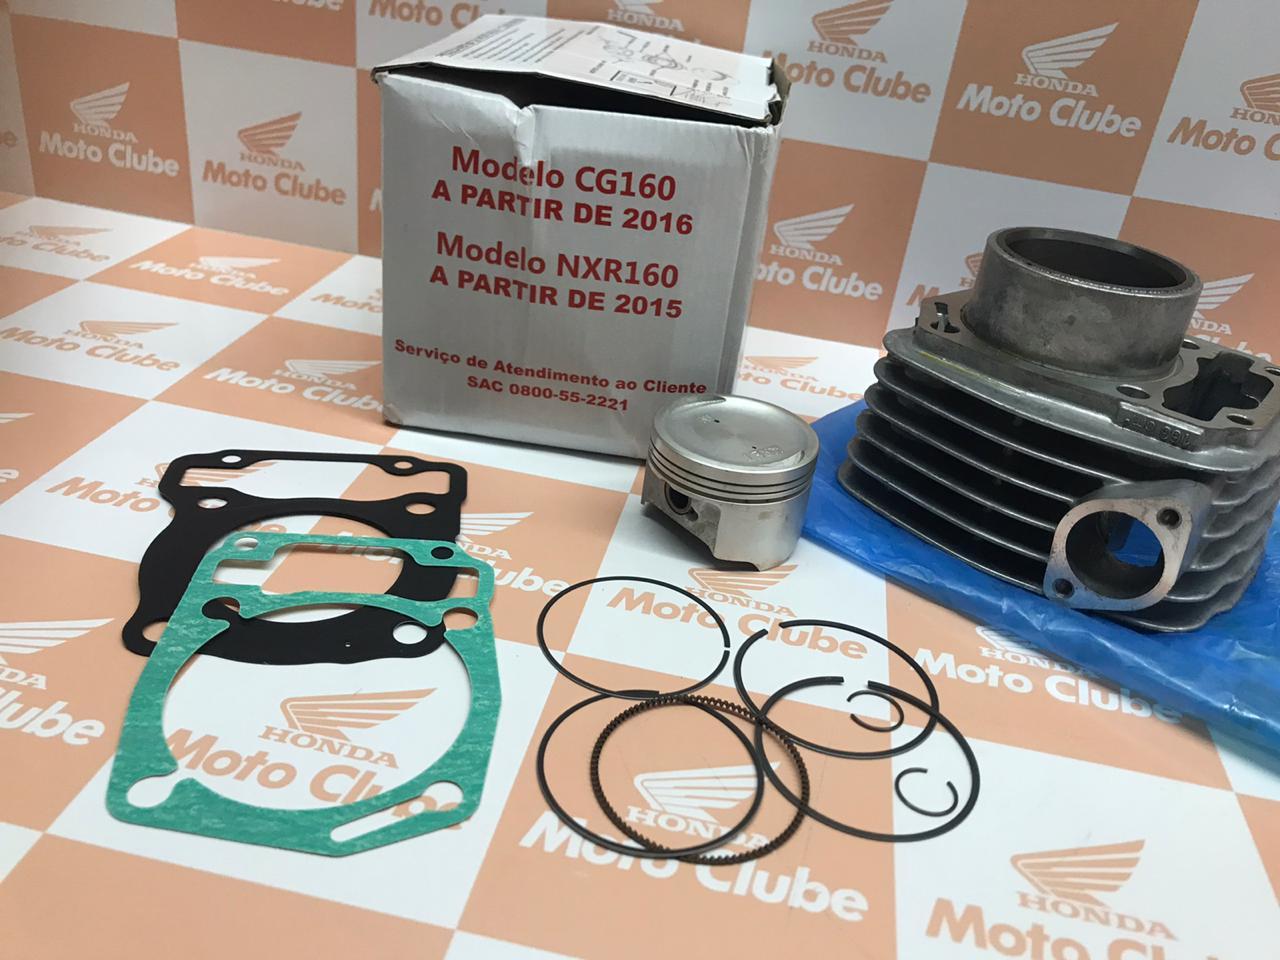 Kit Cilindro CG 160 NXR Bros 160 15-20 Original Honda 06121KVS305